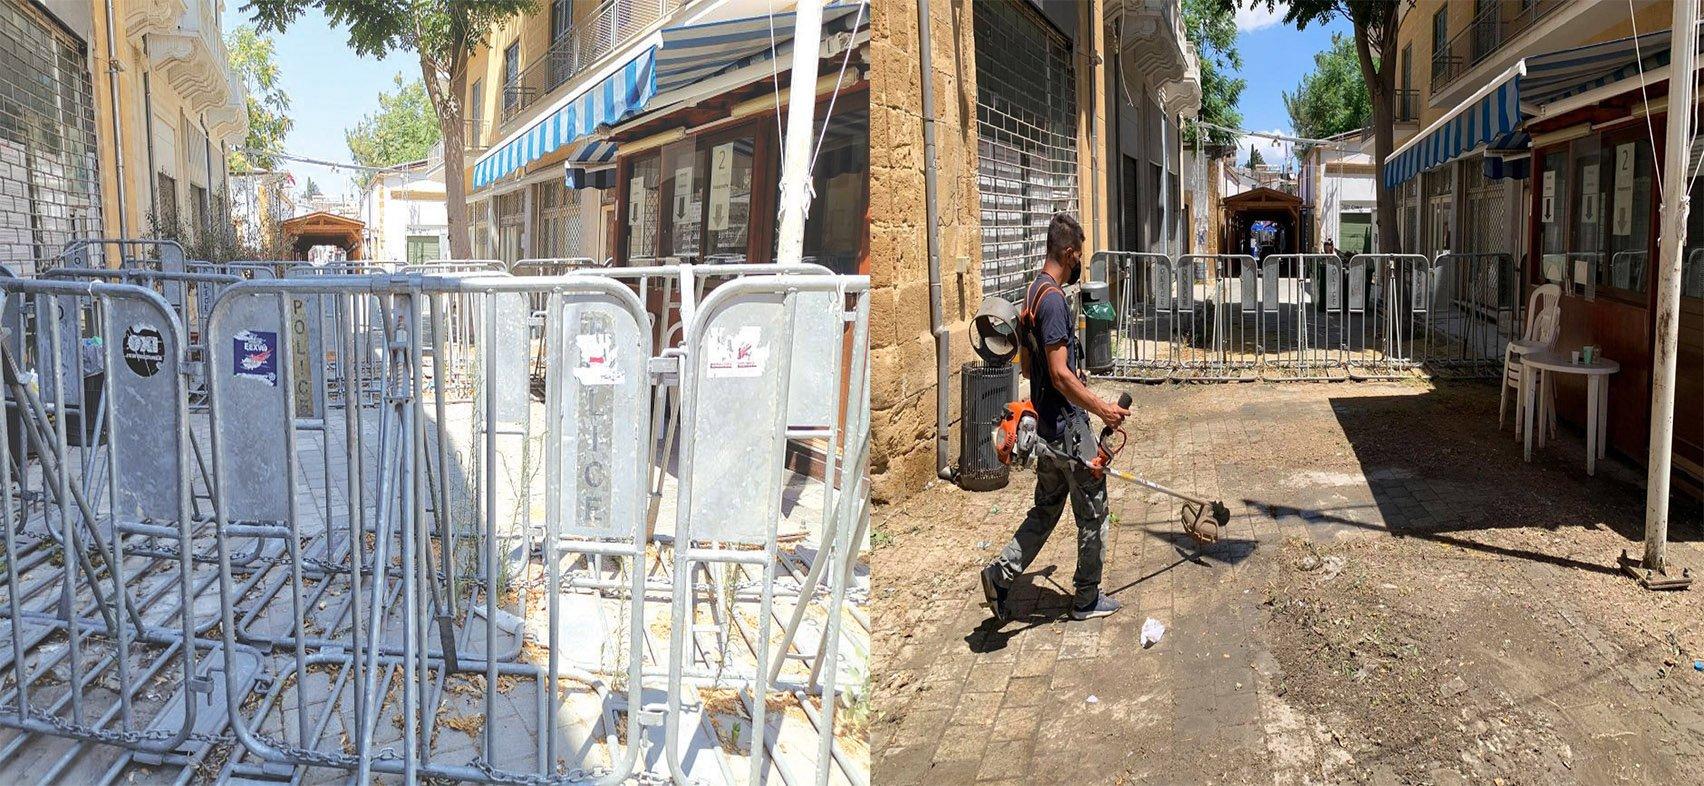 ledra street before after mashup